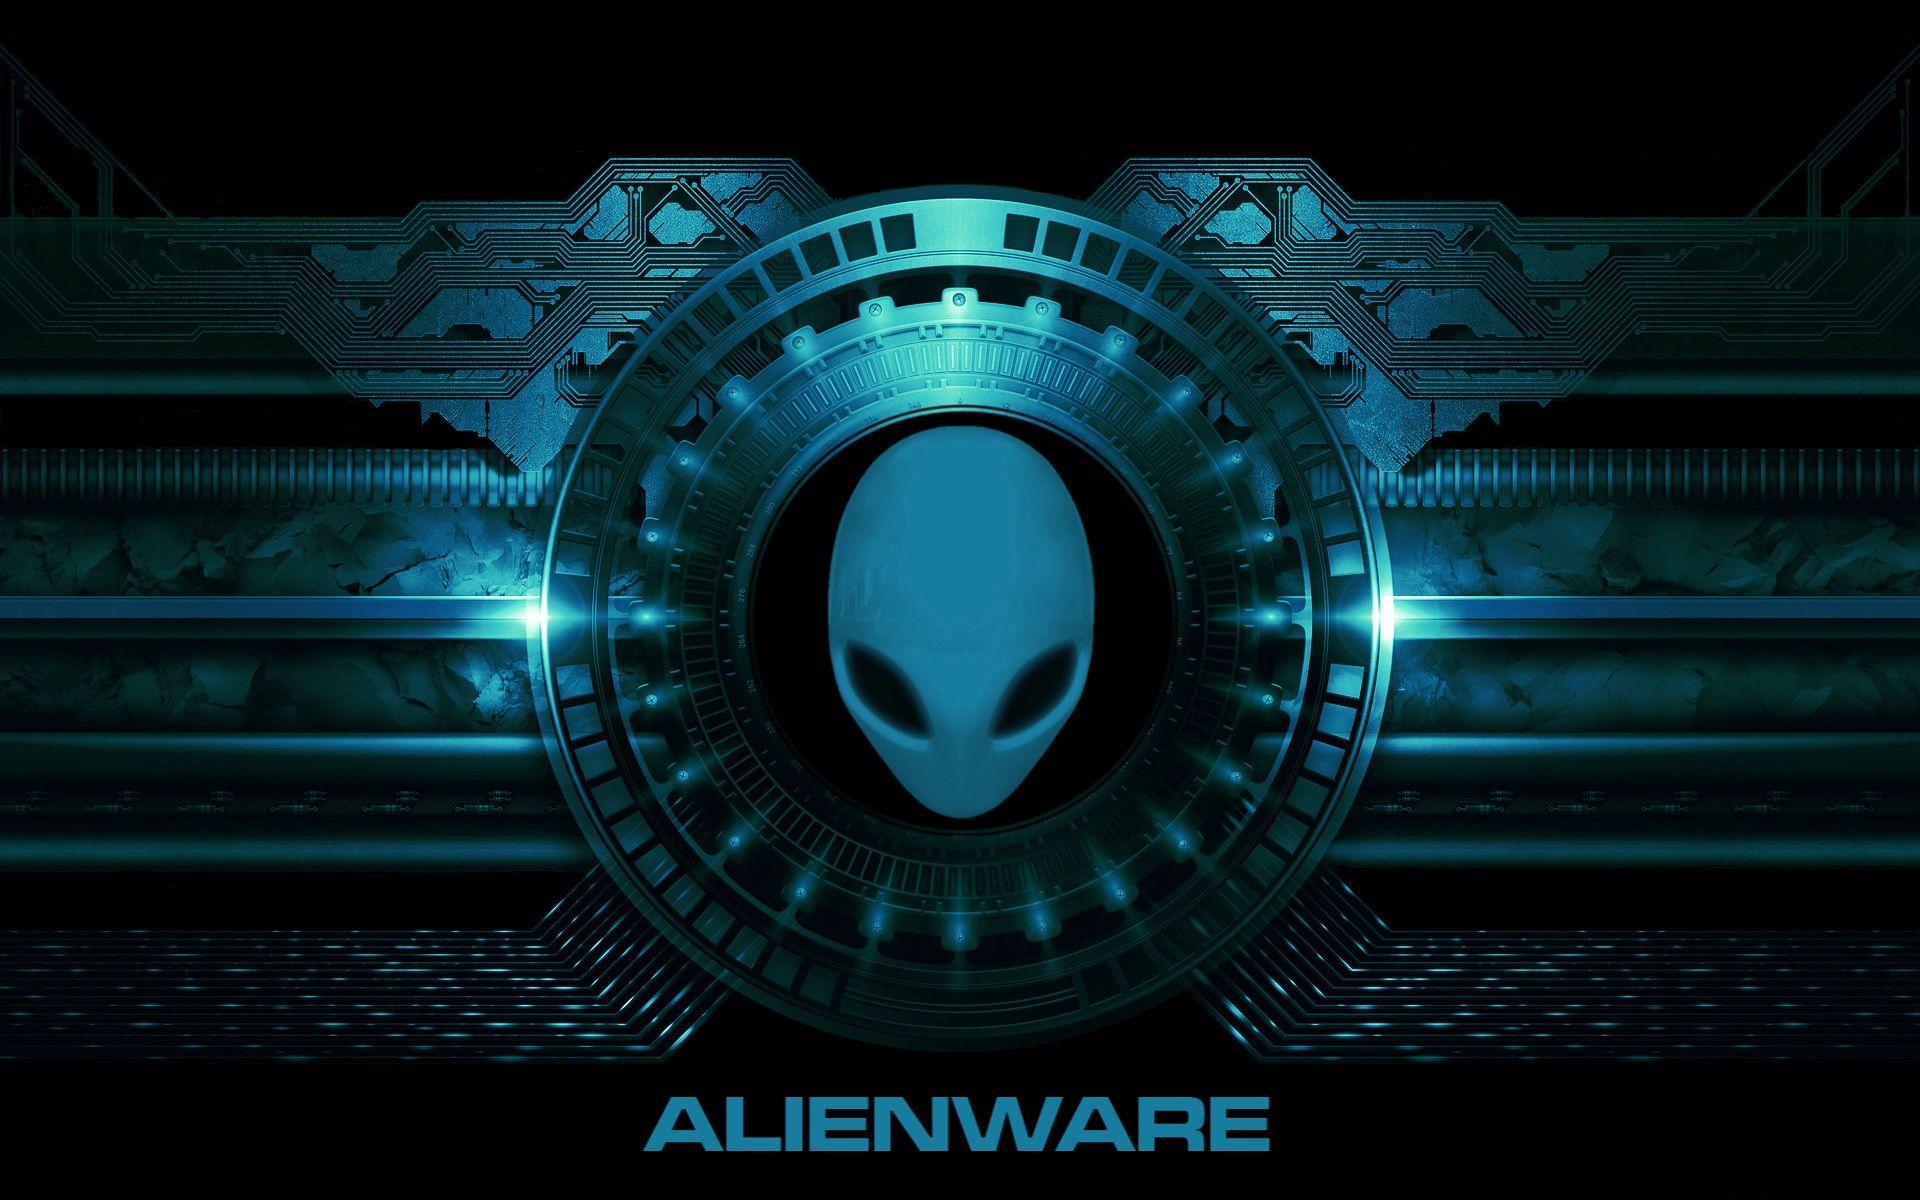 Alienware Wallpaper Blue Hd Wallpapers Alienware Desktop Dark Wallpaper Sci Fi Wallpaper